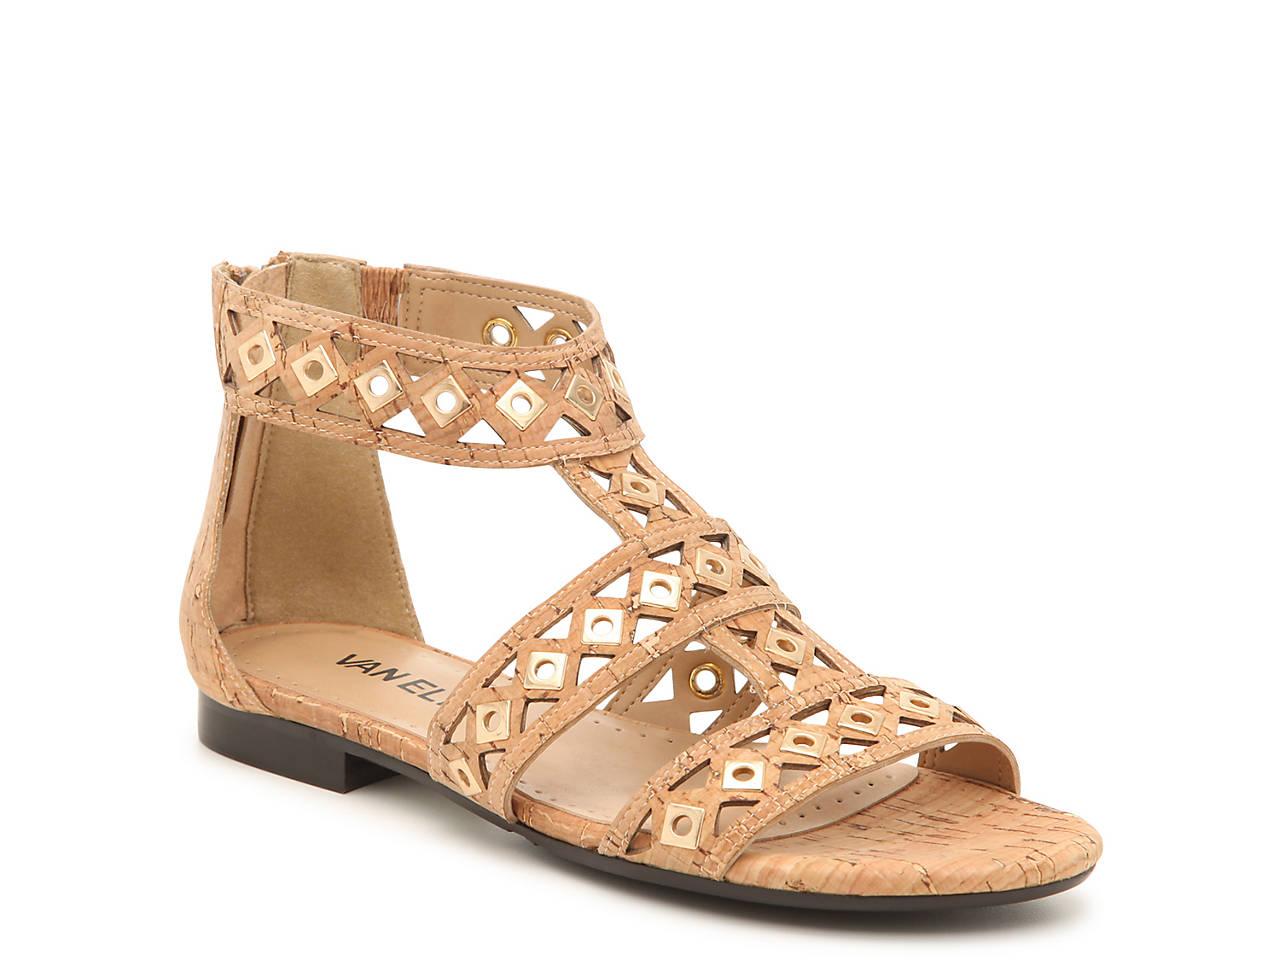 8451c7dc6582 VANELi Edana Gladiator Sandal Women s Shoes